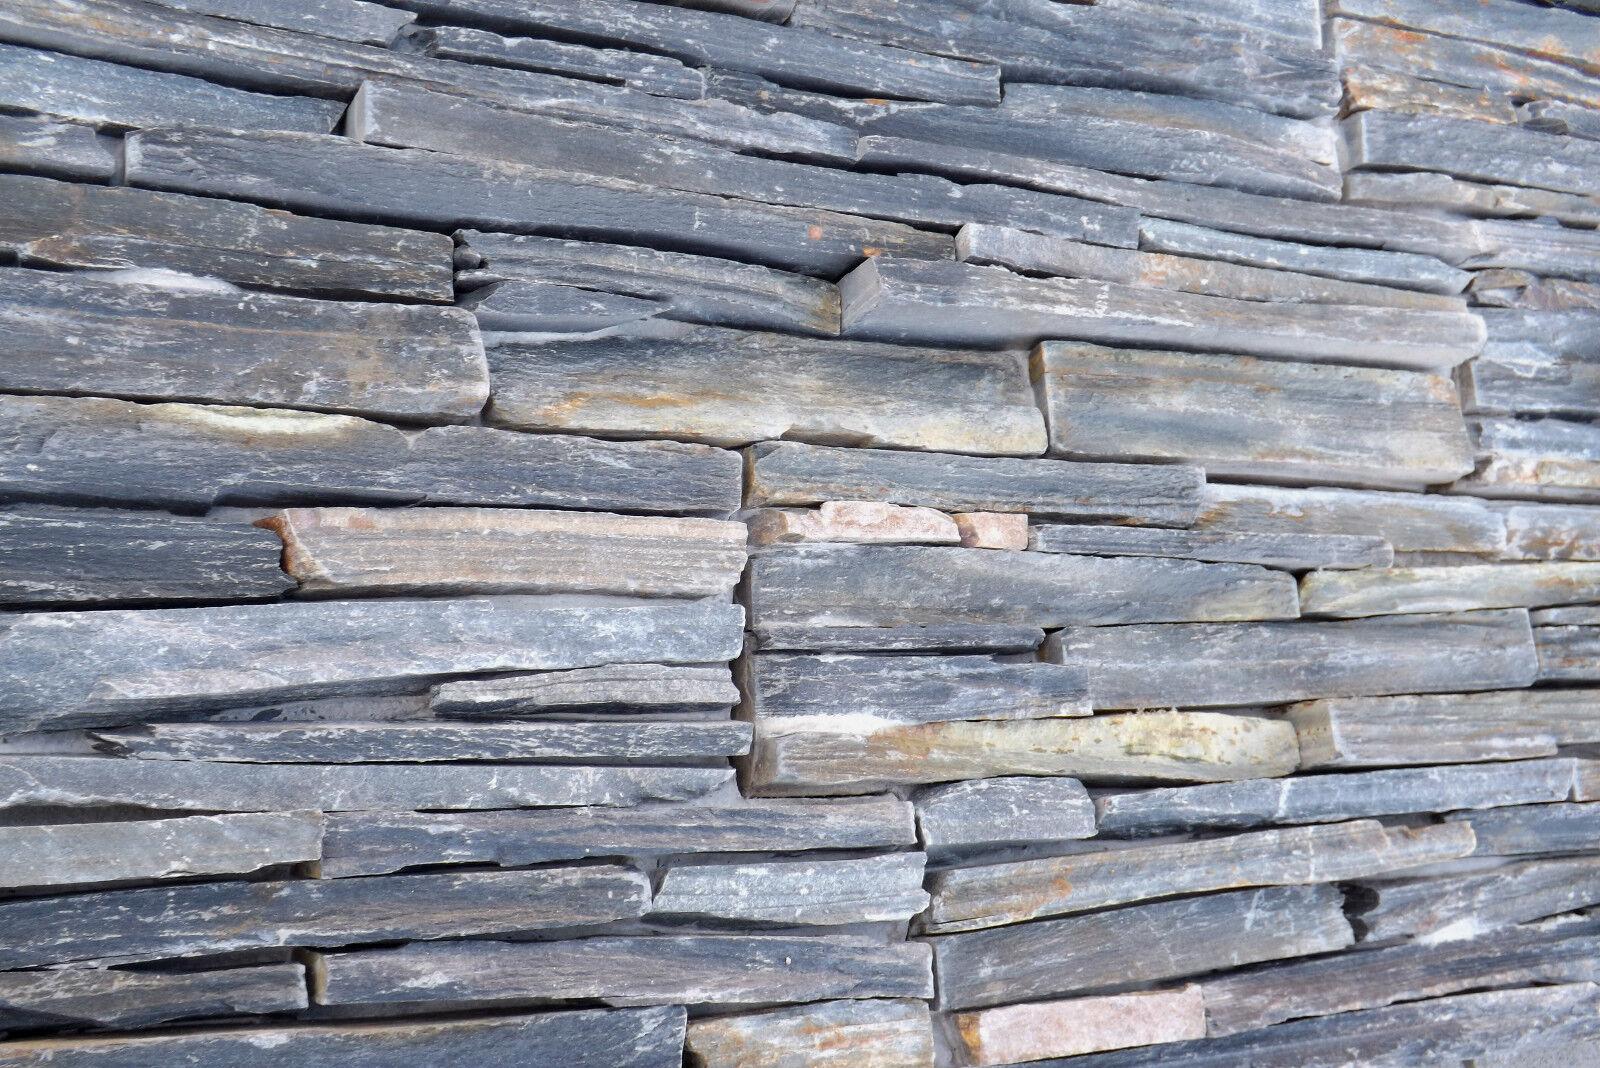 naturstein verblender sockelverblender wandverkleidung schiefer rustikal eur 8 90. Black Bedroom Furniture Sets. Home Design Ideas